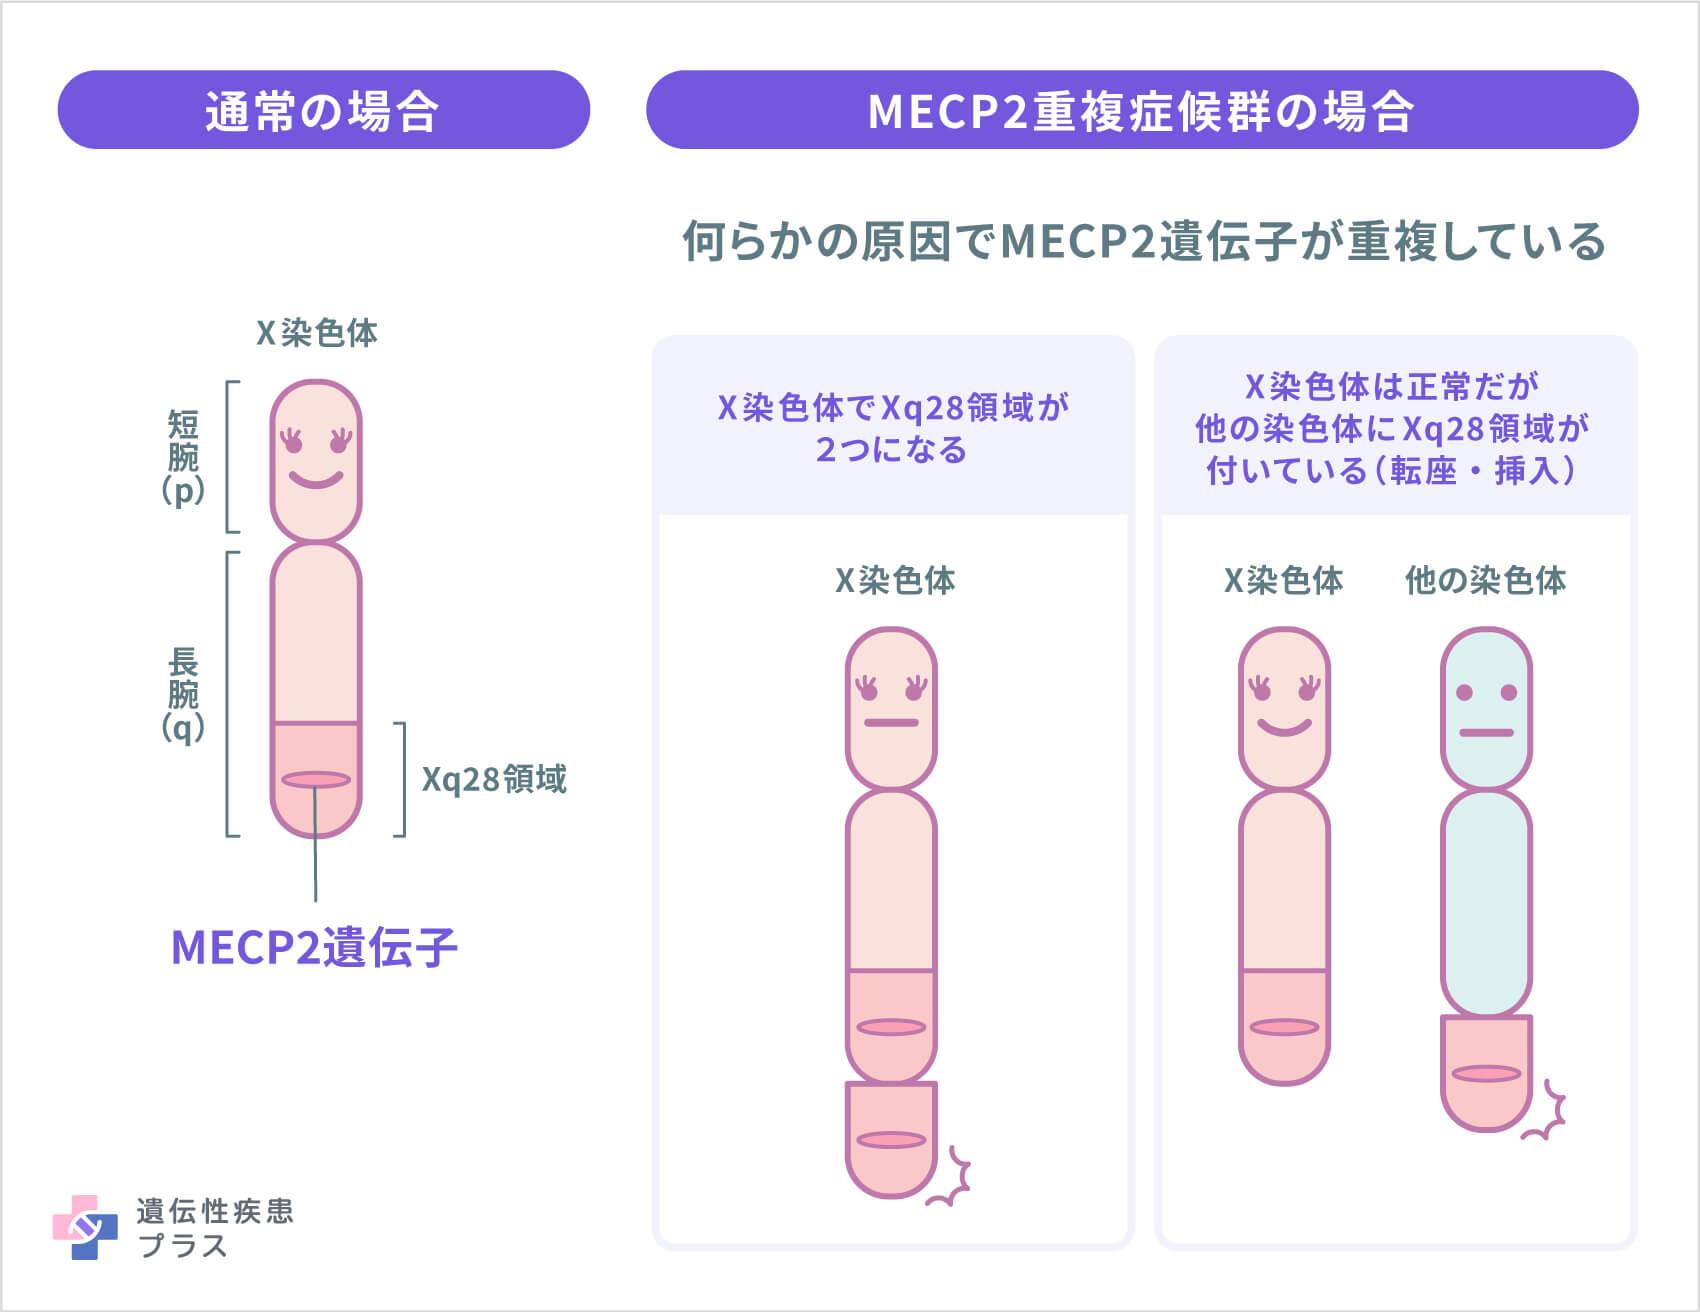 Mecp2重複症候群